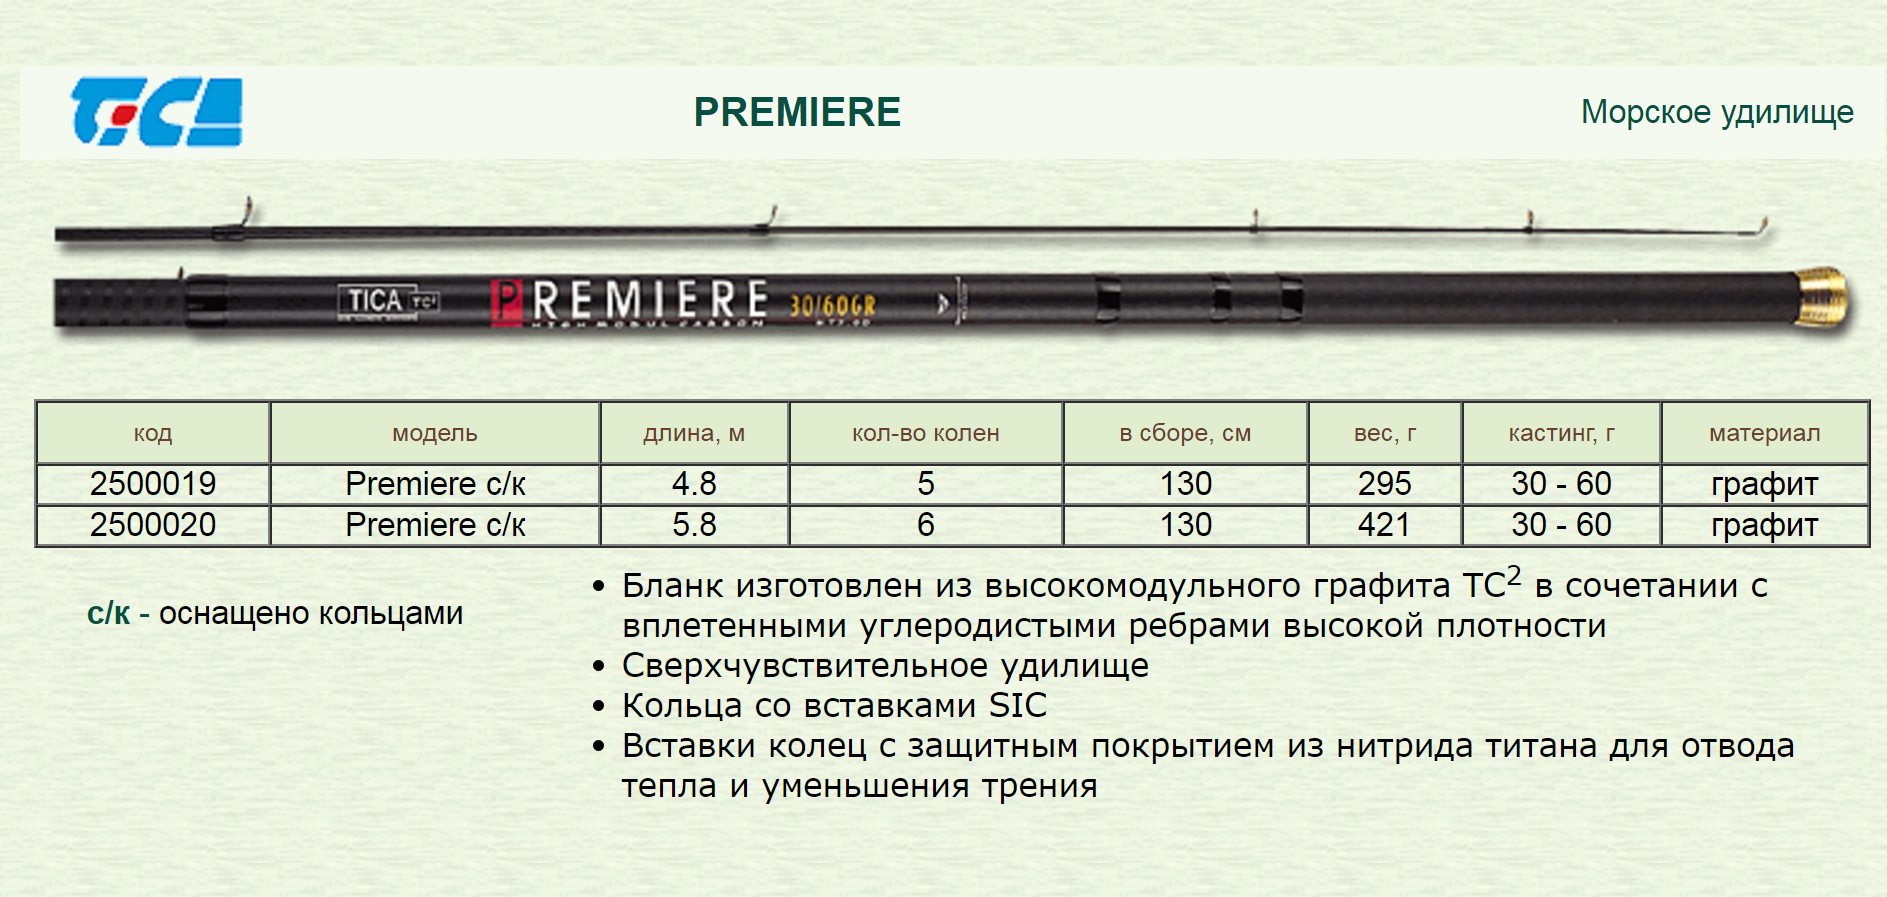 Удочка Tica Premiere с кольцами длина 4.80 м тест 30-60 грамм